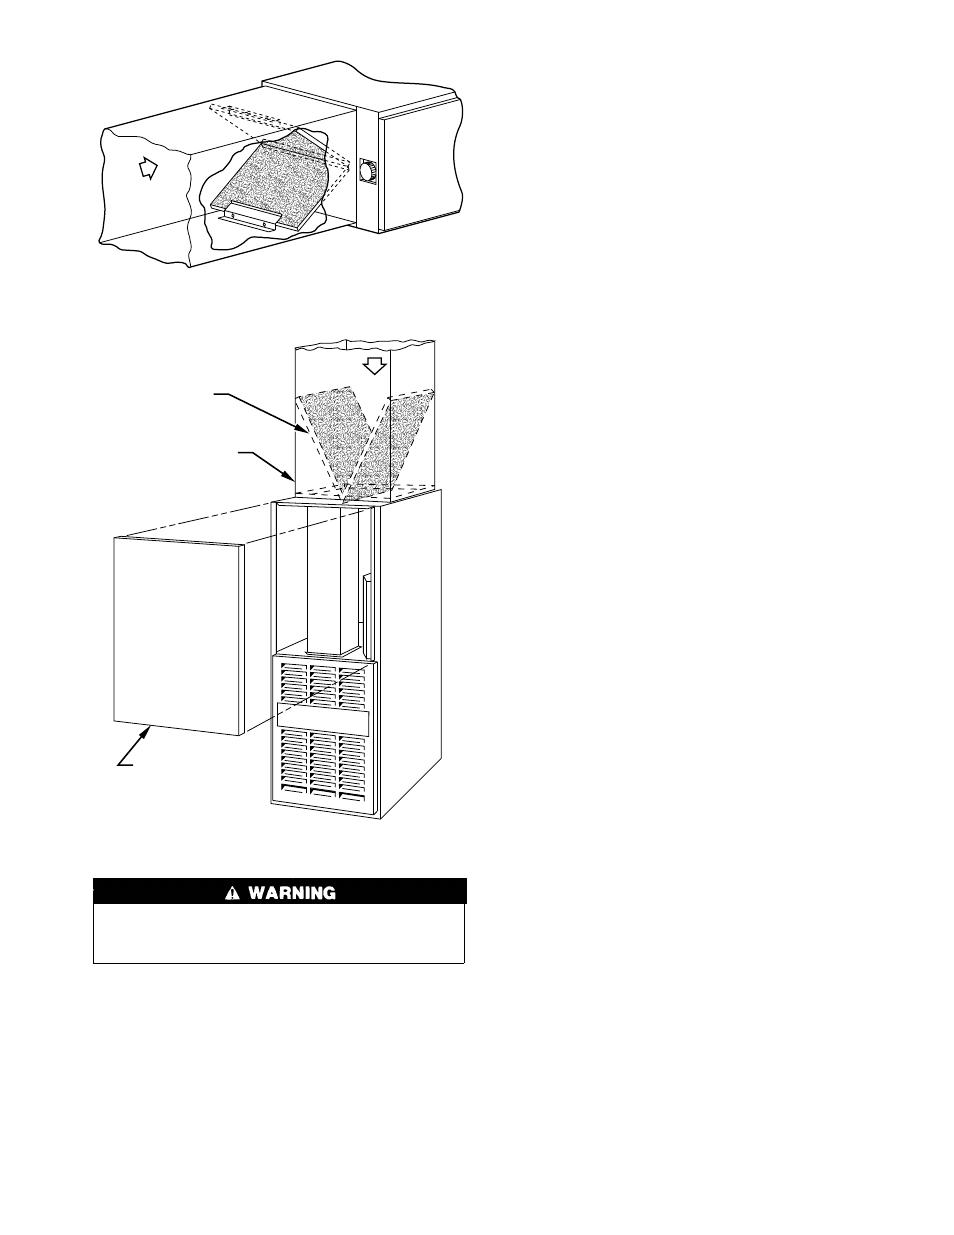 carrier series 131 58pav user manual page 3 12 original mode rh manualsdir com 58PAV Carrier Furnace Reset Carrier Furnace Fuse Change